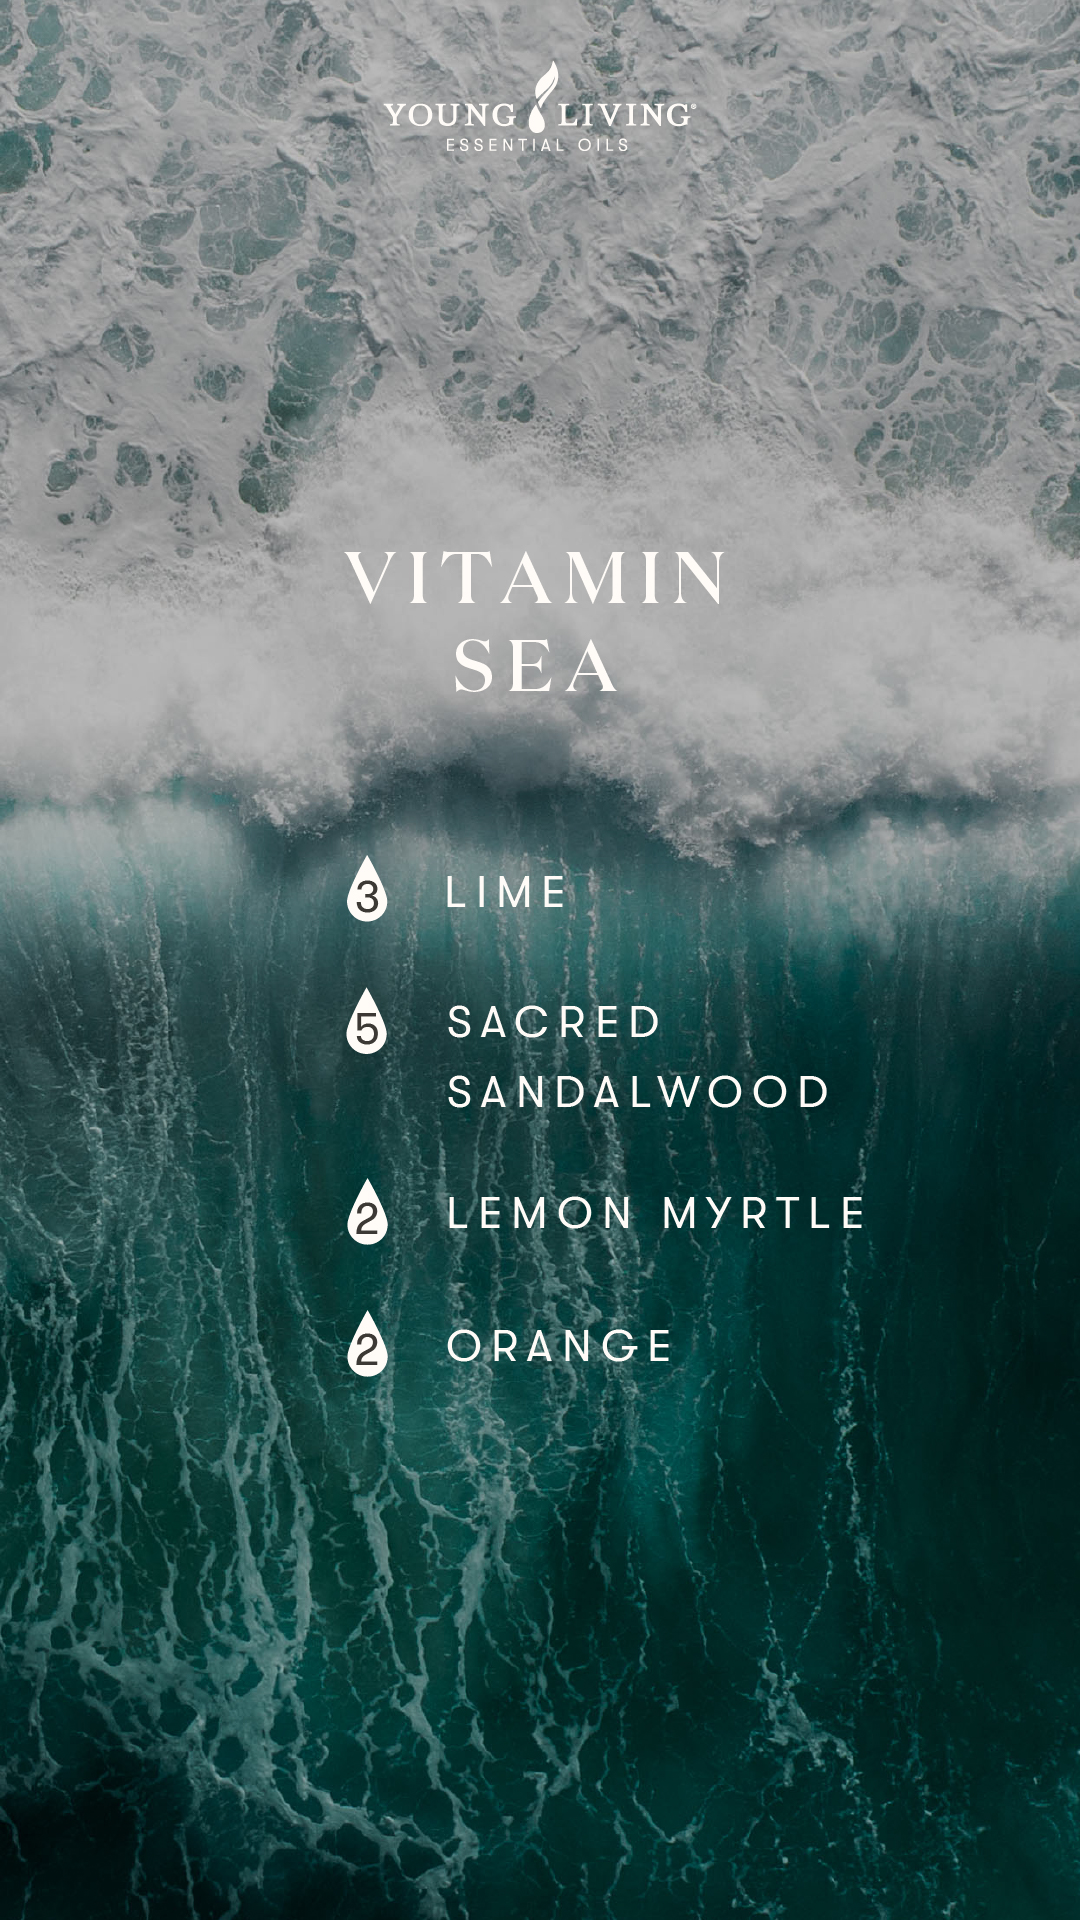 Vitamin sea summer diffuser blend